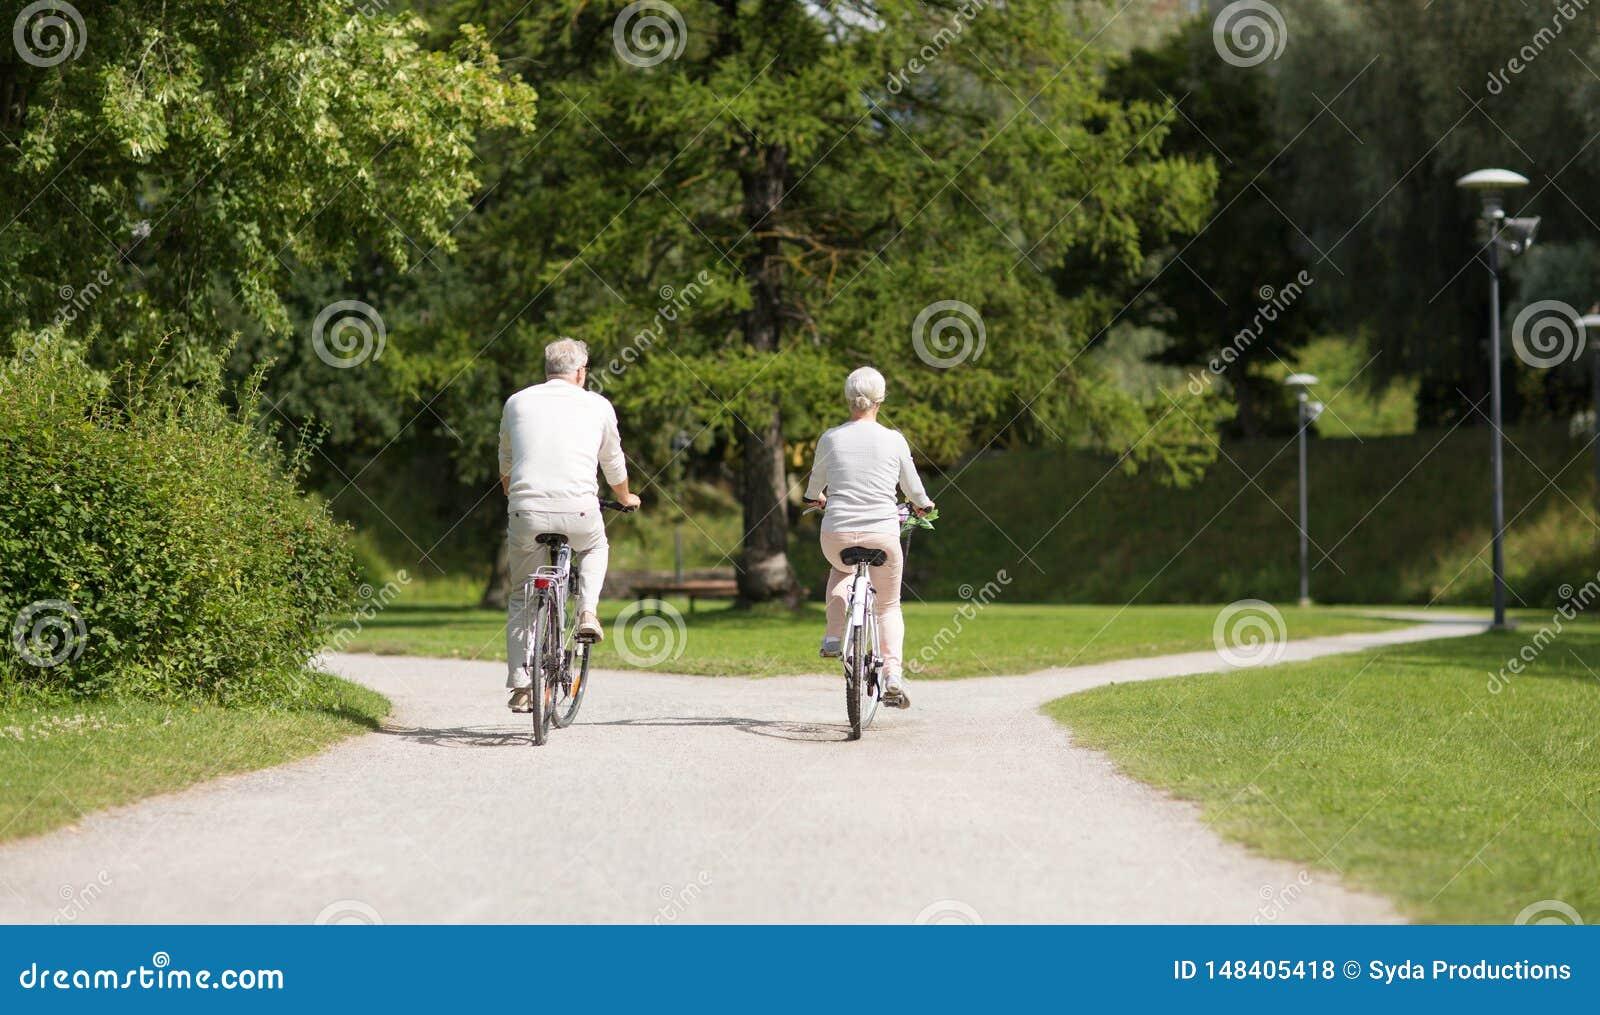 Senior couple riding bicycles at summer park